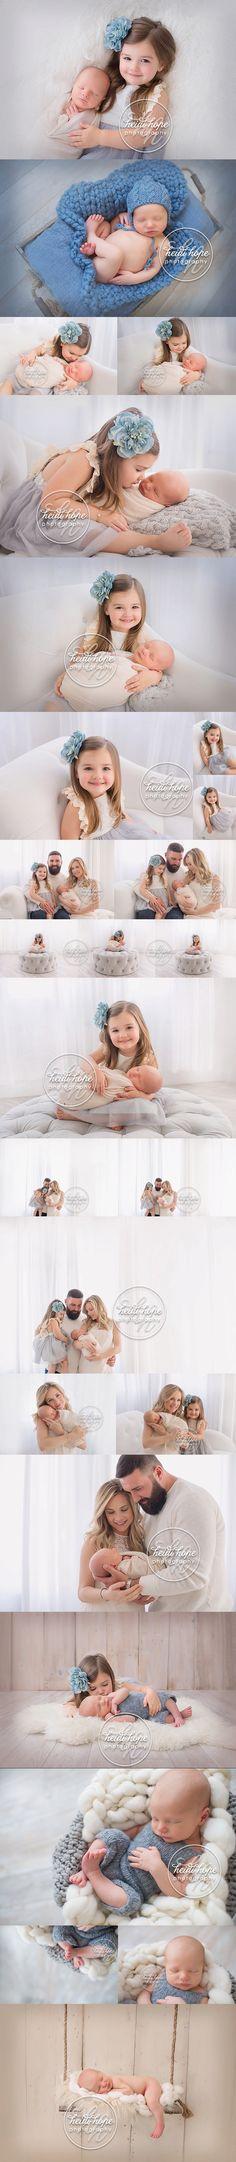 The N family welcomes newborn baby E! New England Newborn...